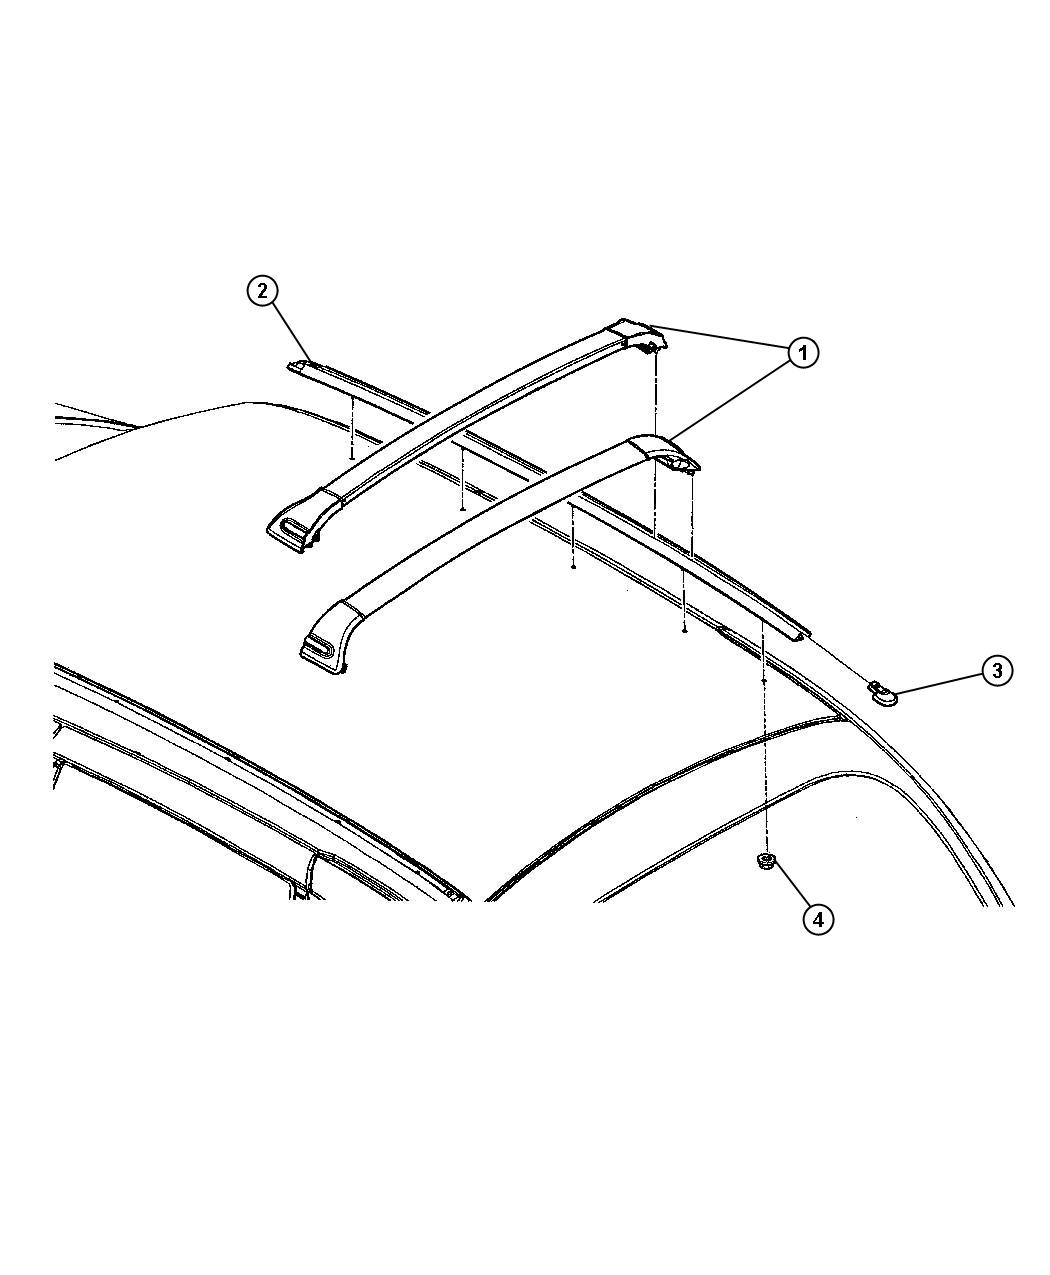 Chrysler Pt Cruiser Rail  Luggage Rack Side  Left  Use Up To 12-3-02